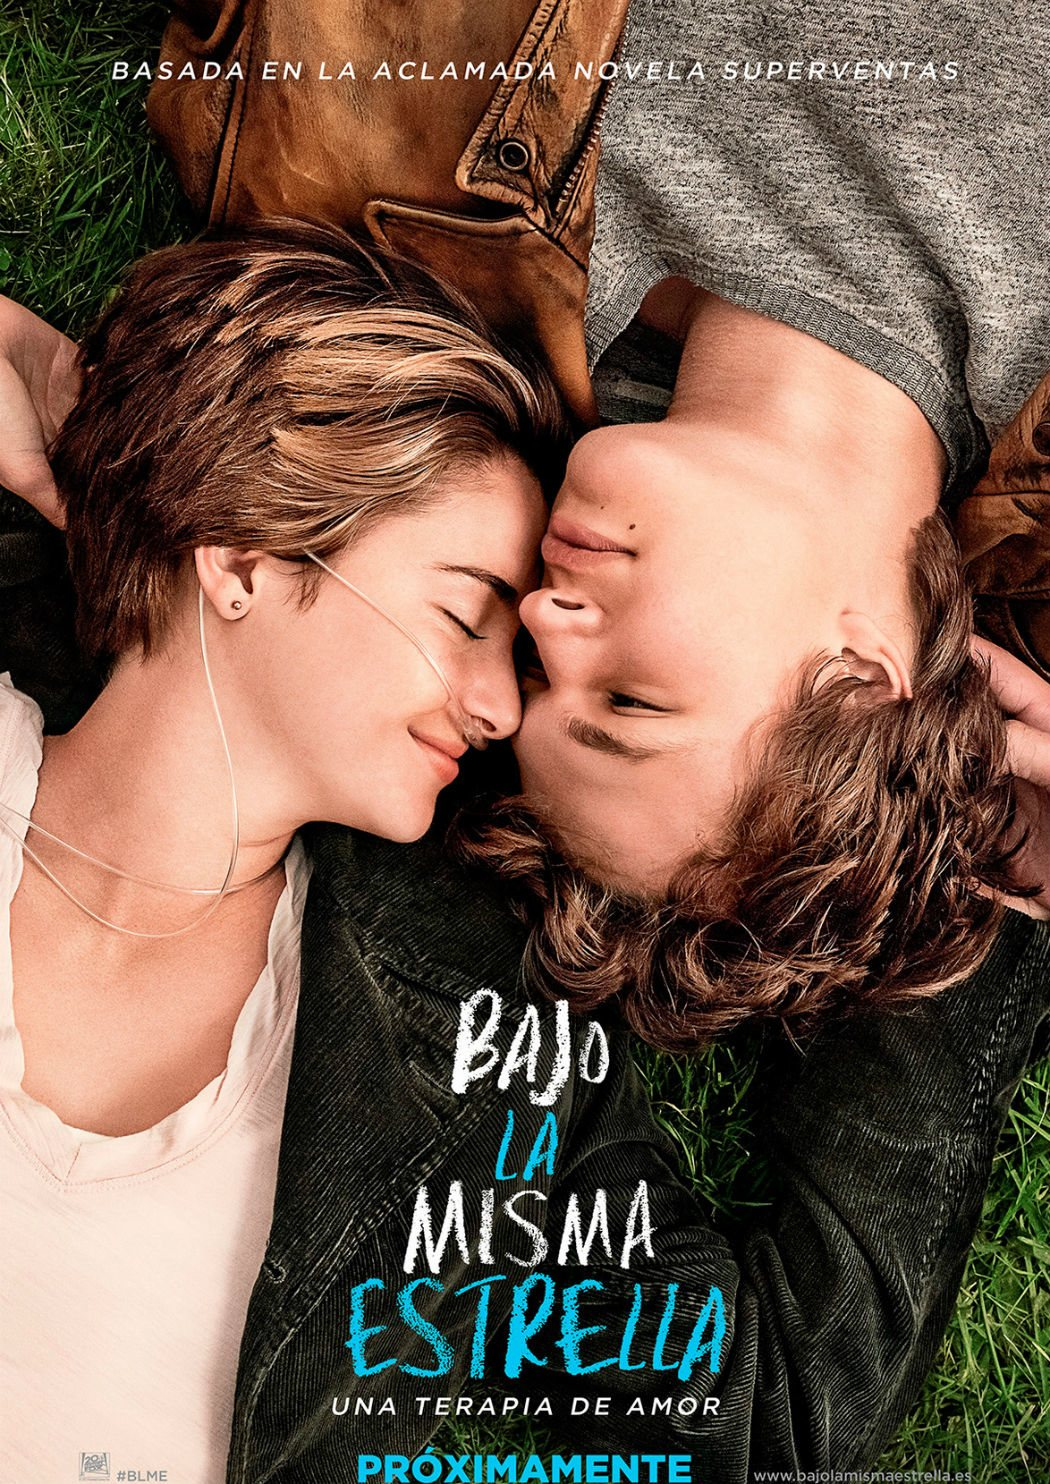 'Bajo la misma estrella' (2014)